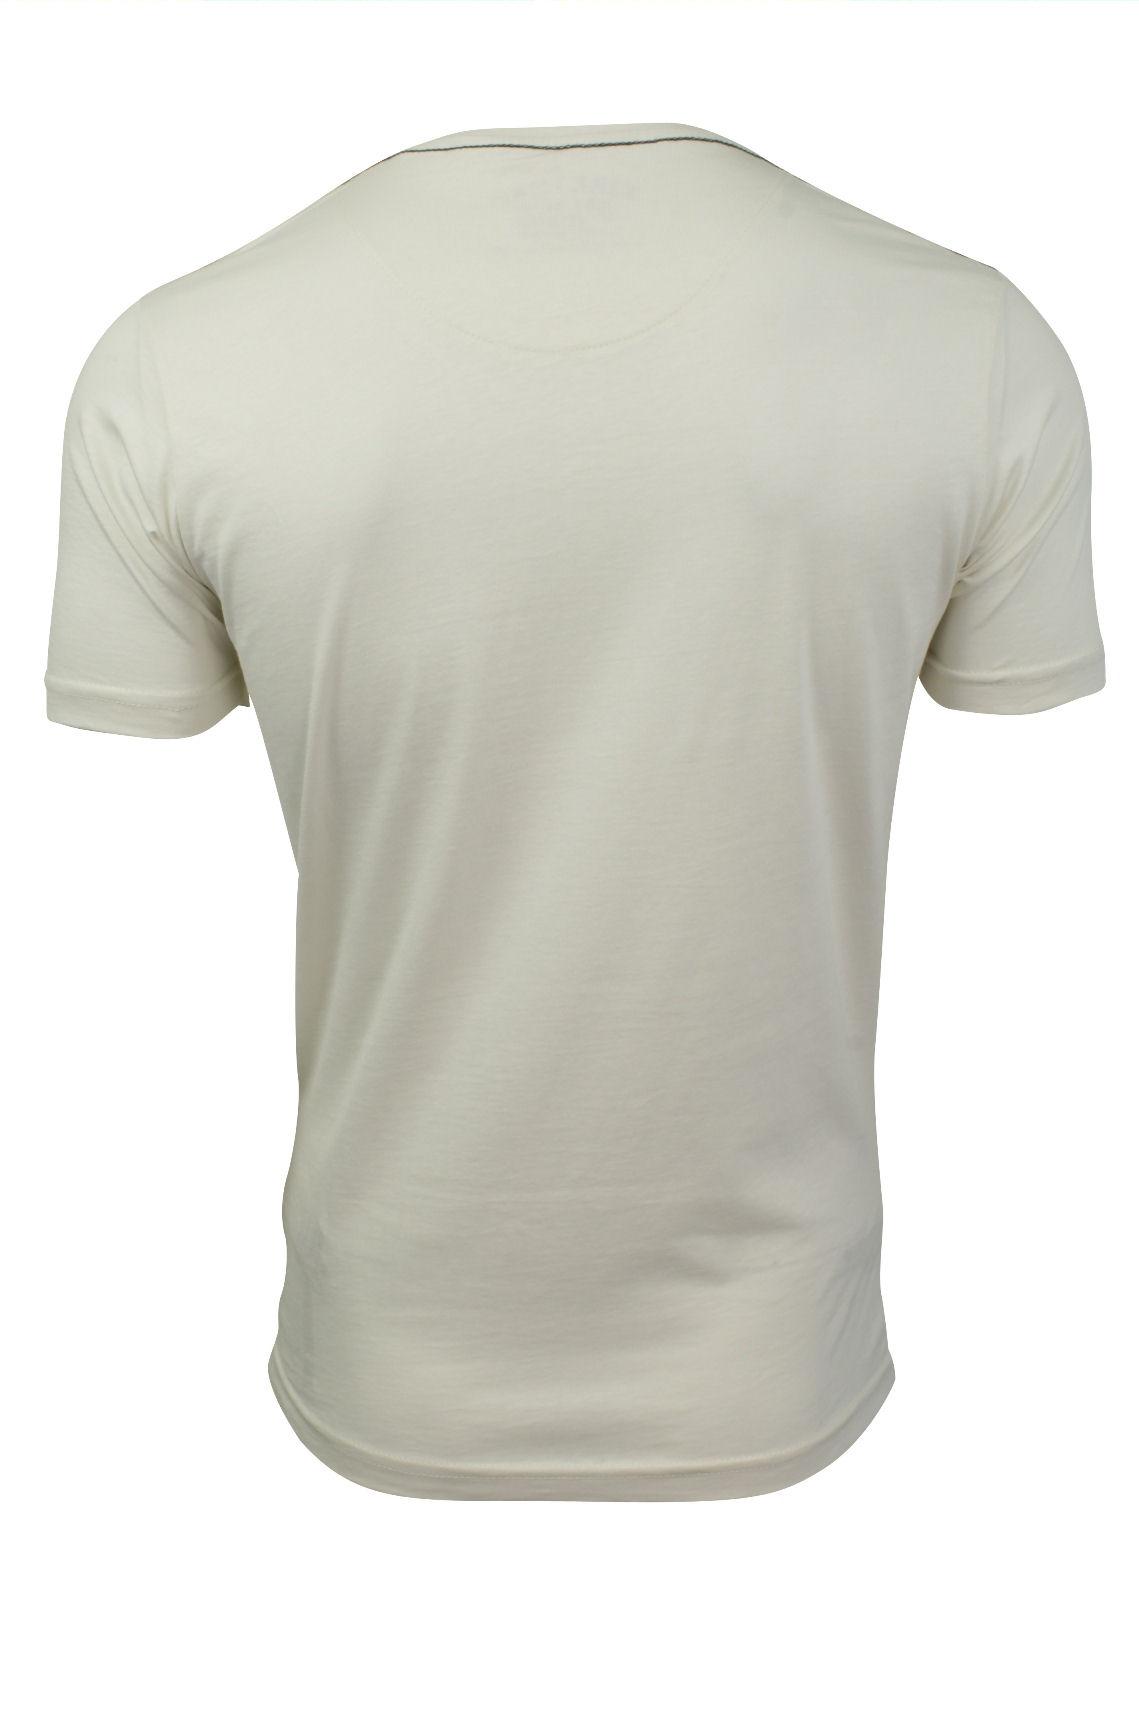 Firetrap-Hombre-Camiseta-de-manga-corta-039-Towson-039 miniatura 15